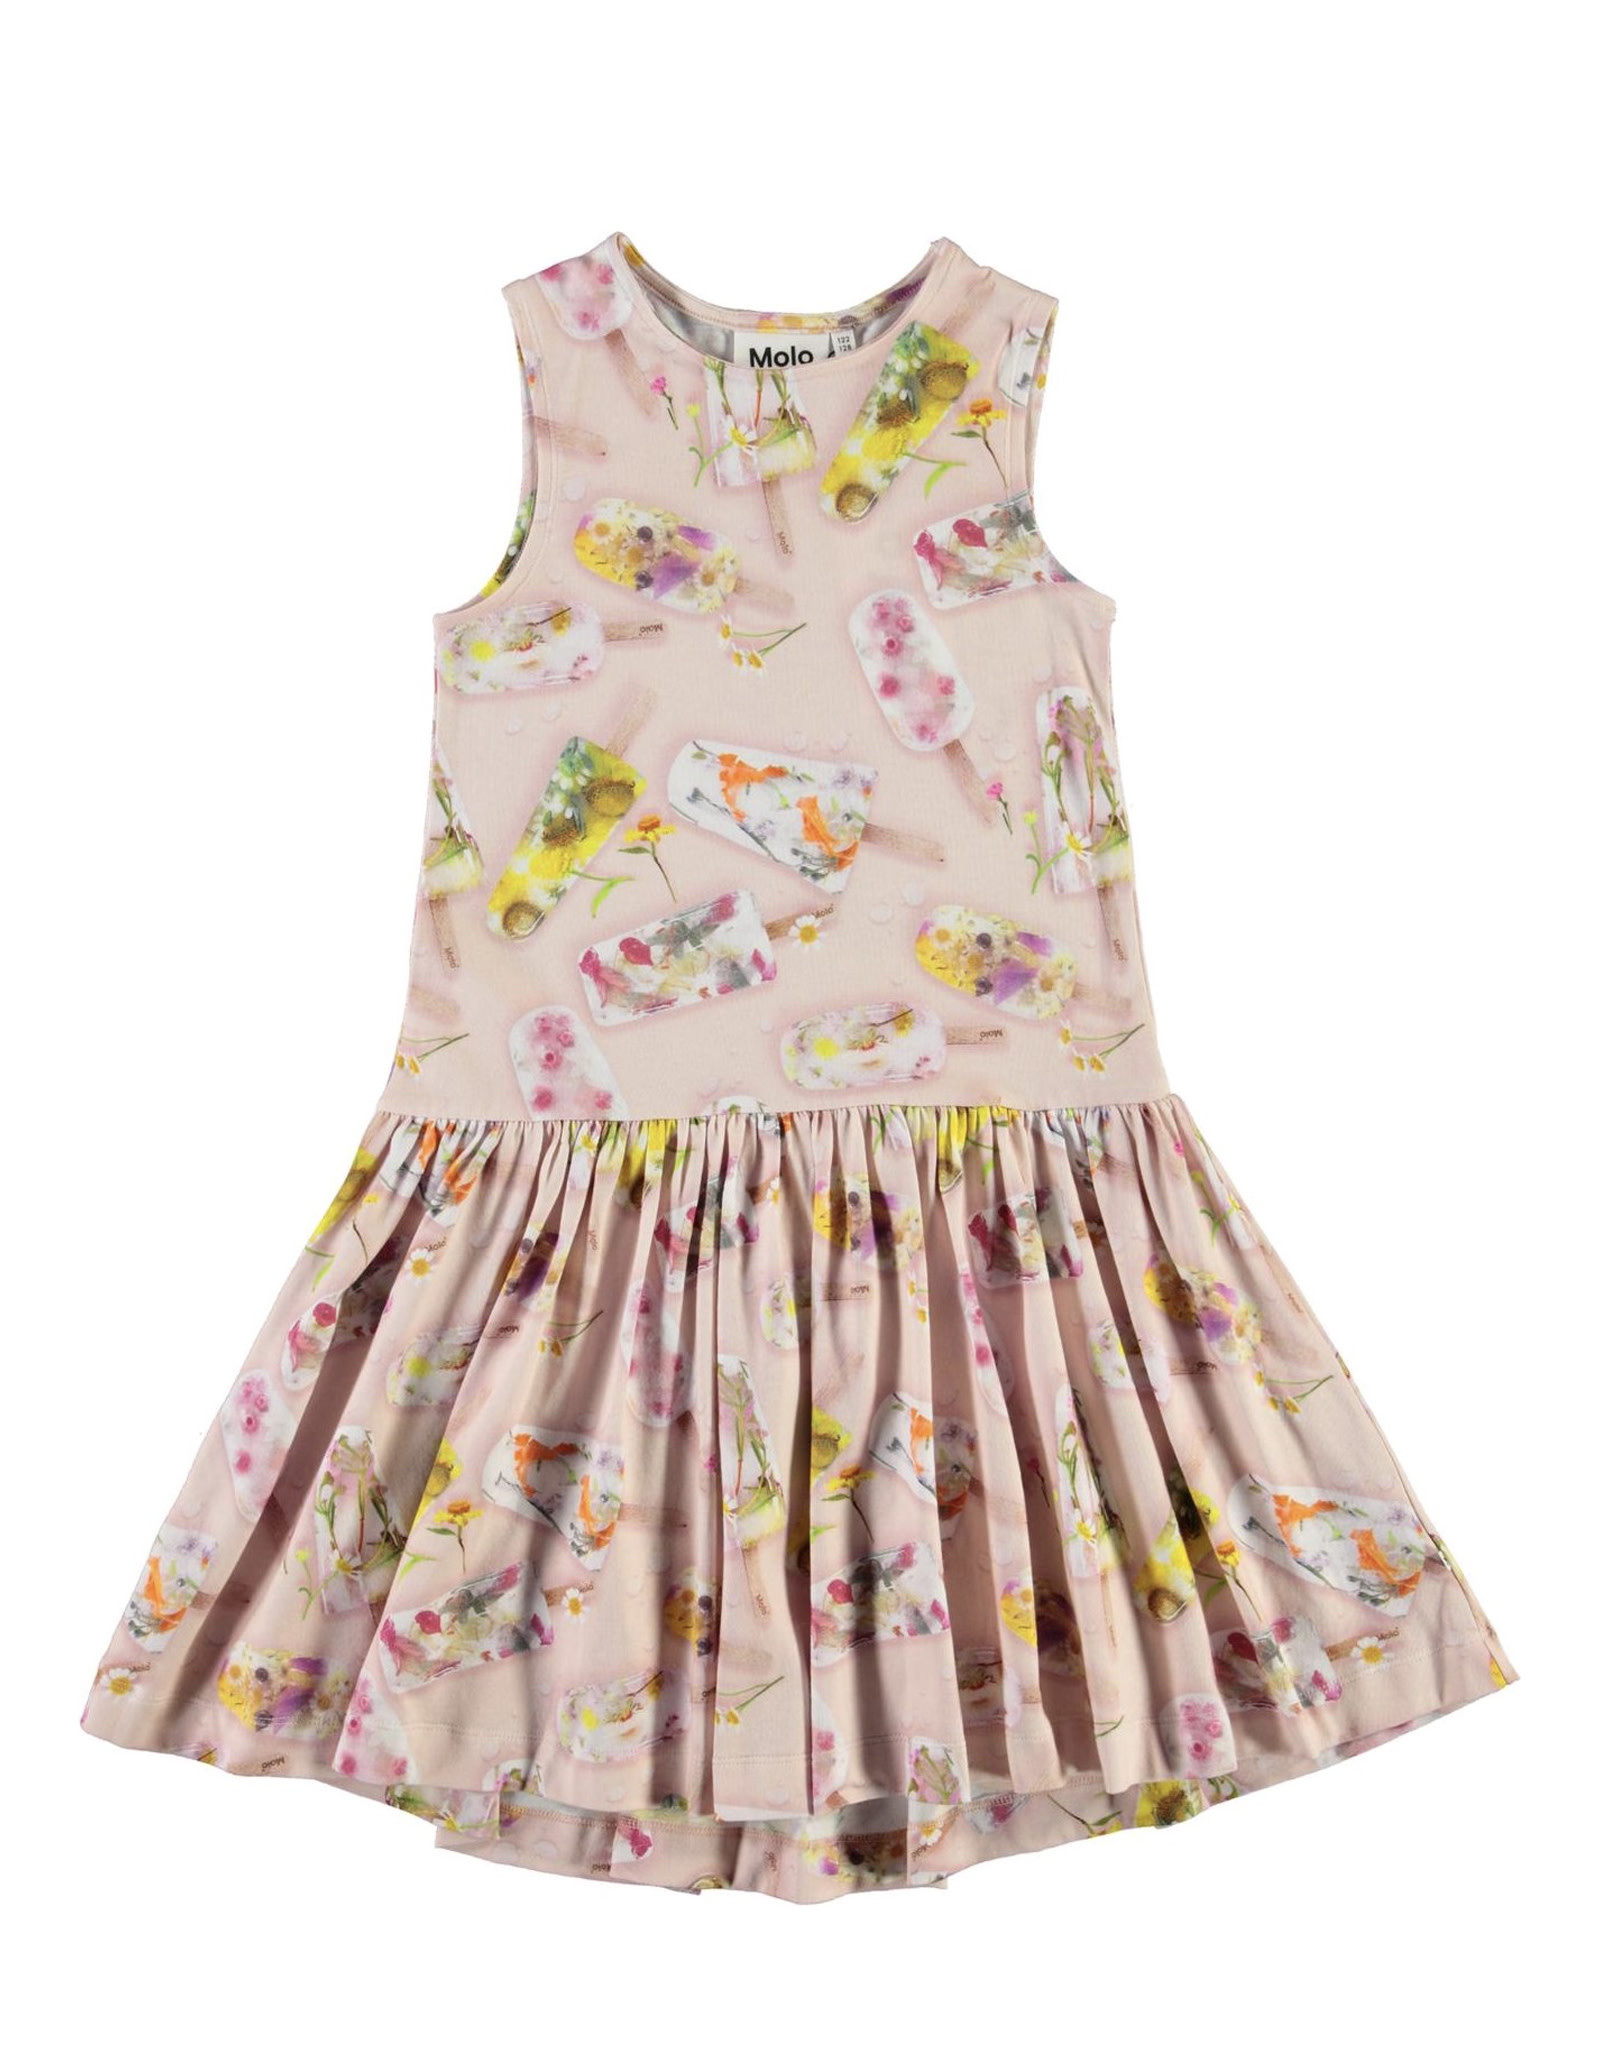 Molo Candece Ice Lollies Dress